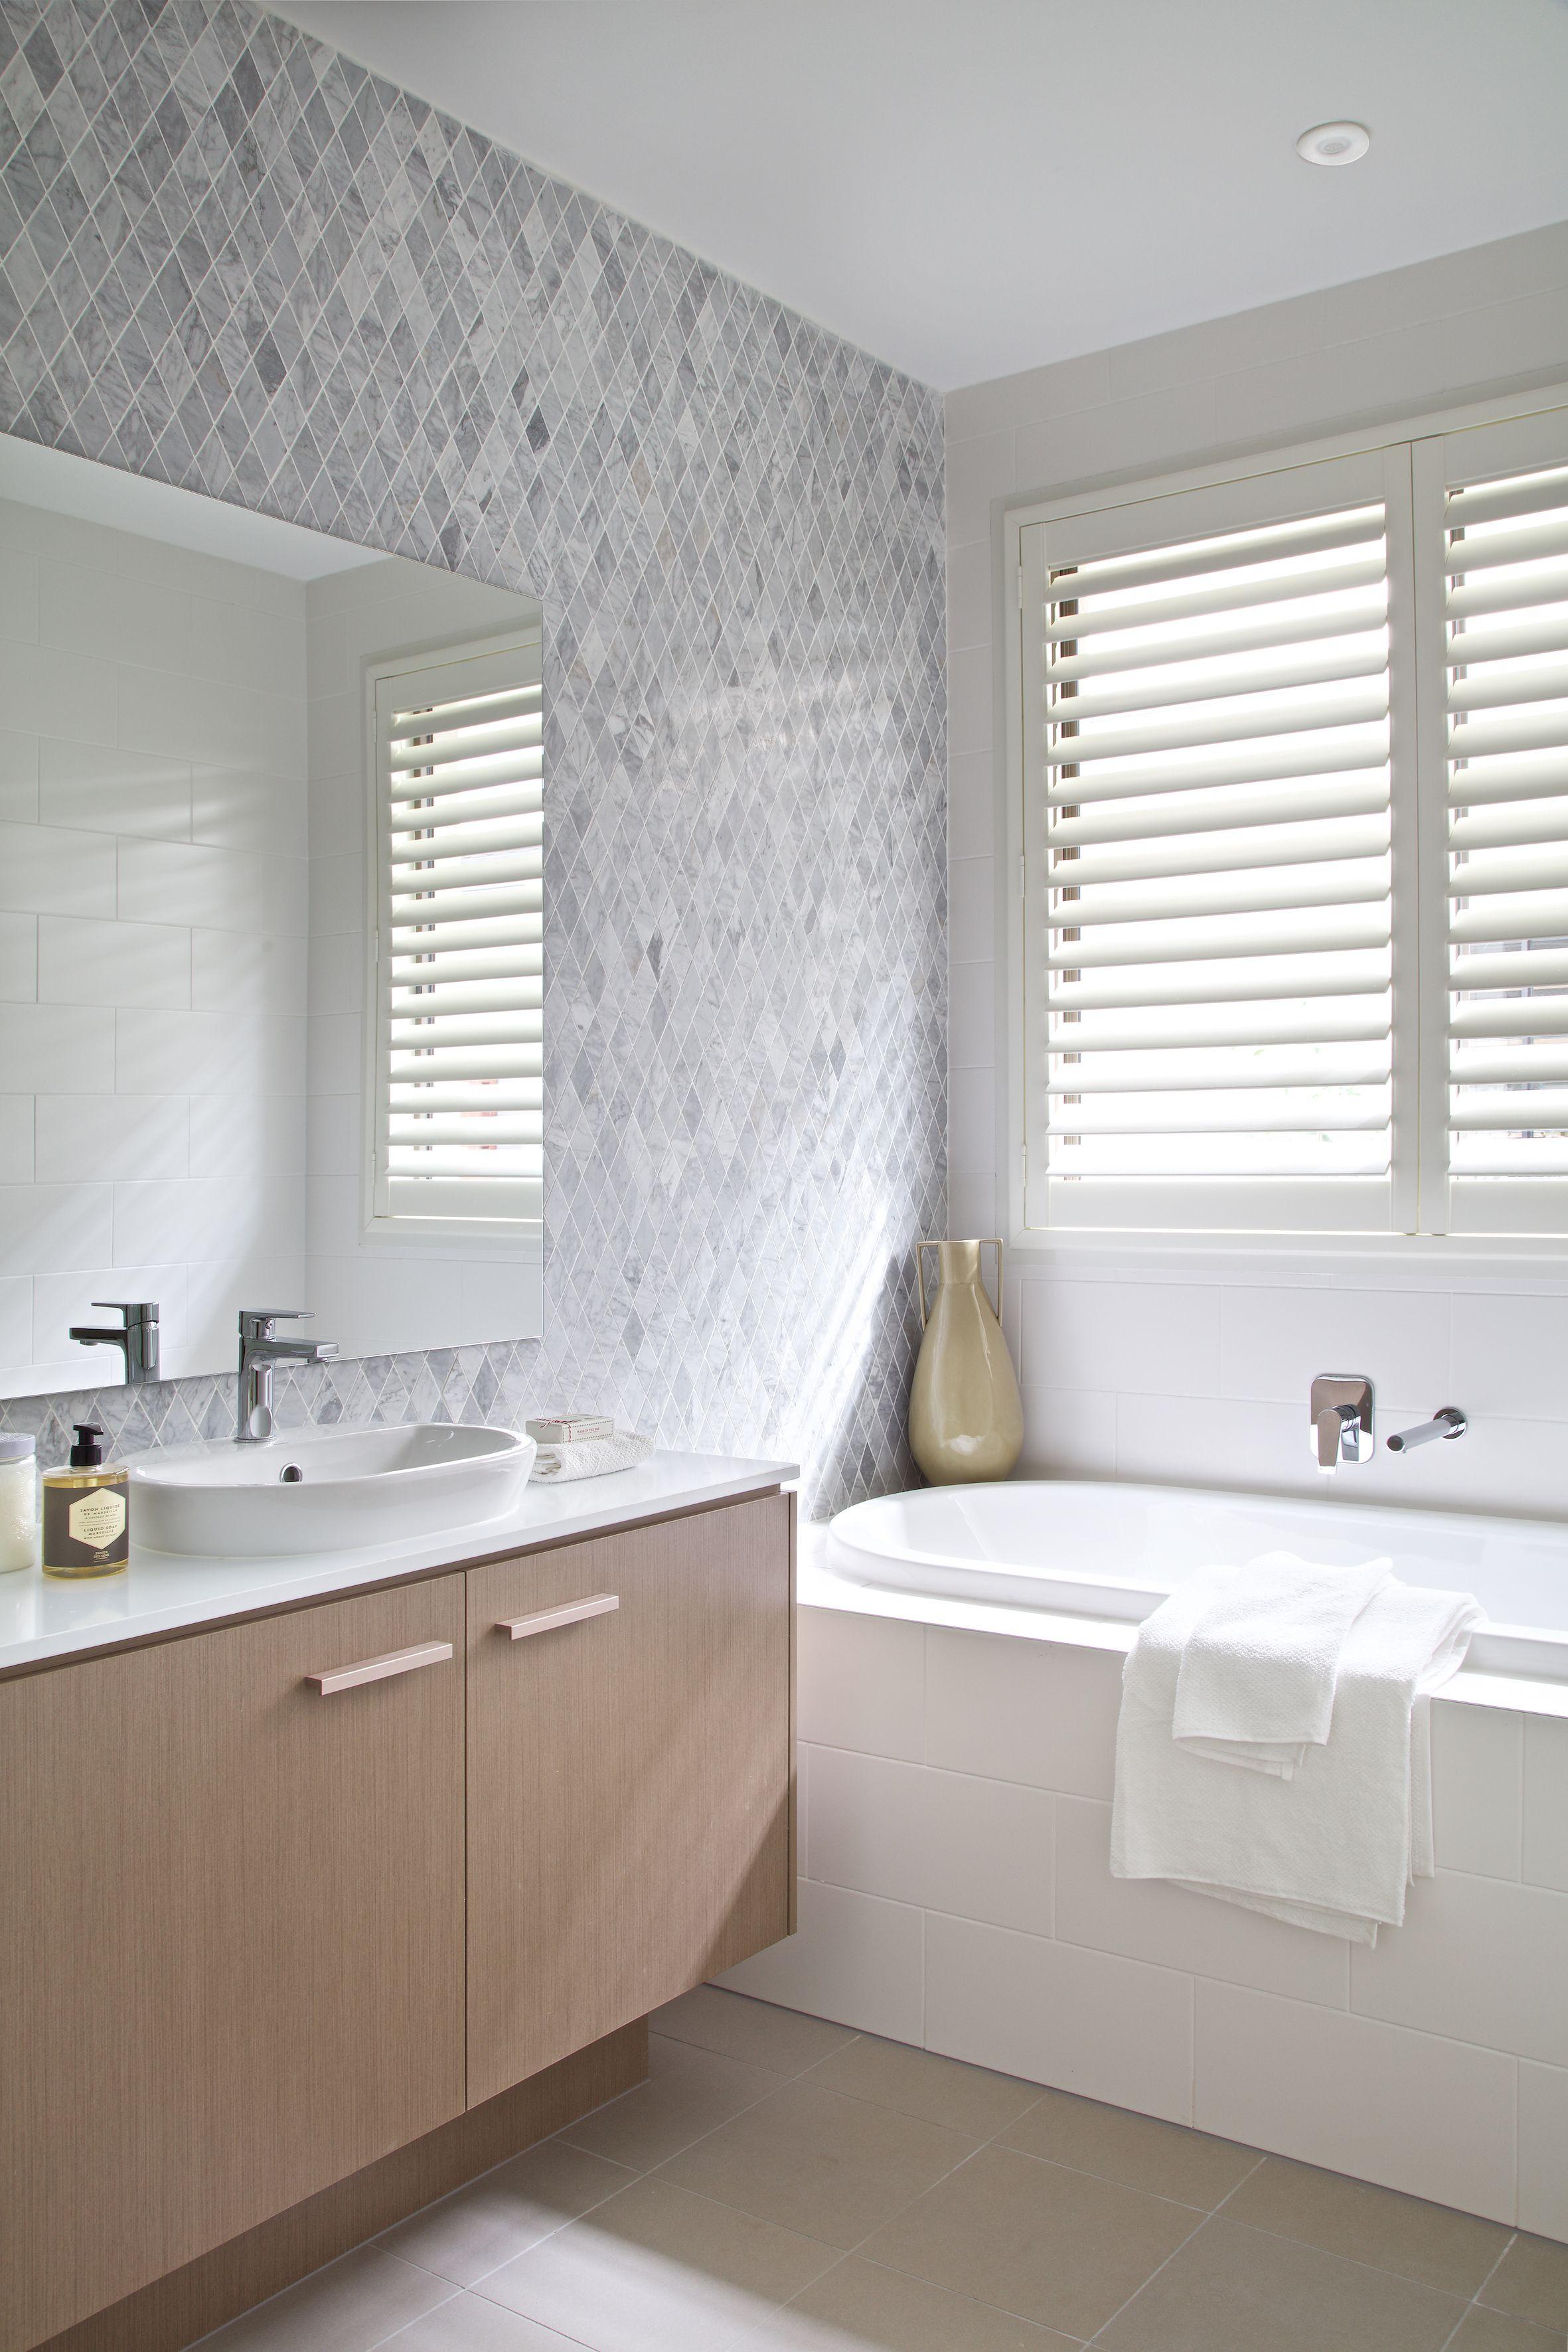 Terracedale 28 | Bath tubs, Tubs and Bath